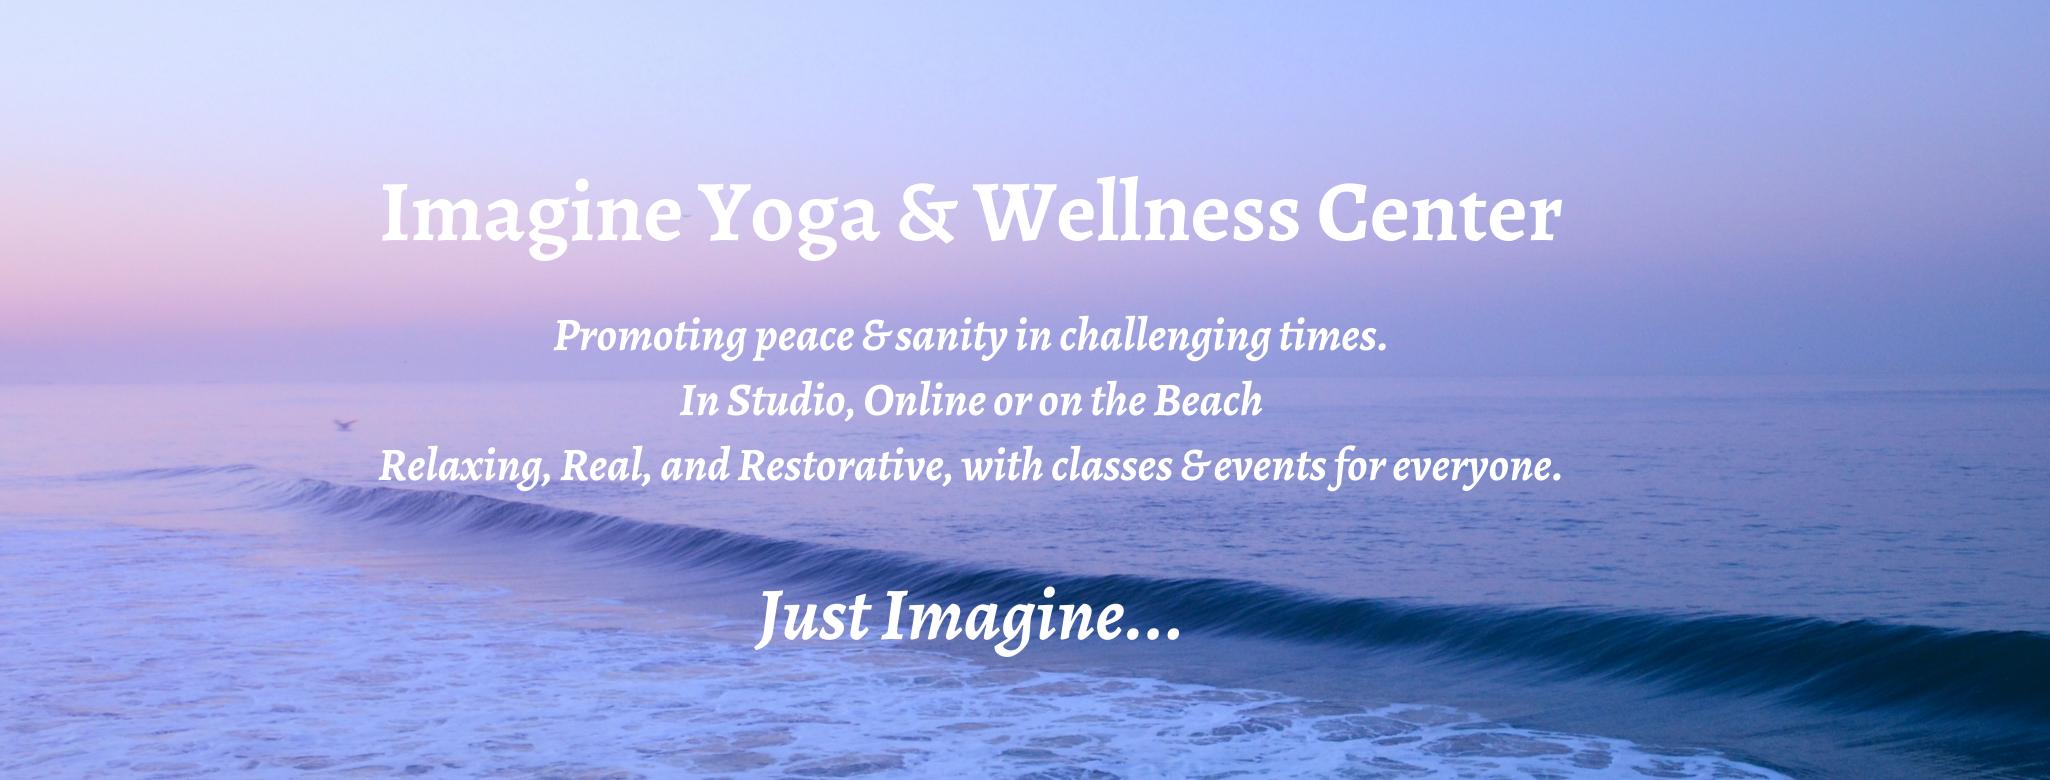 Imagine Yoga & Wellness Center (3)